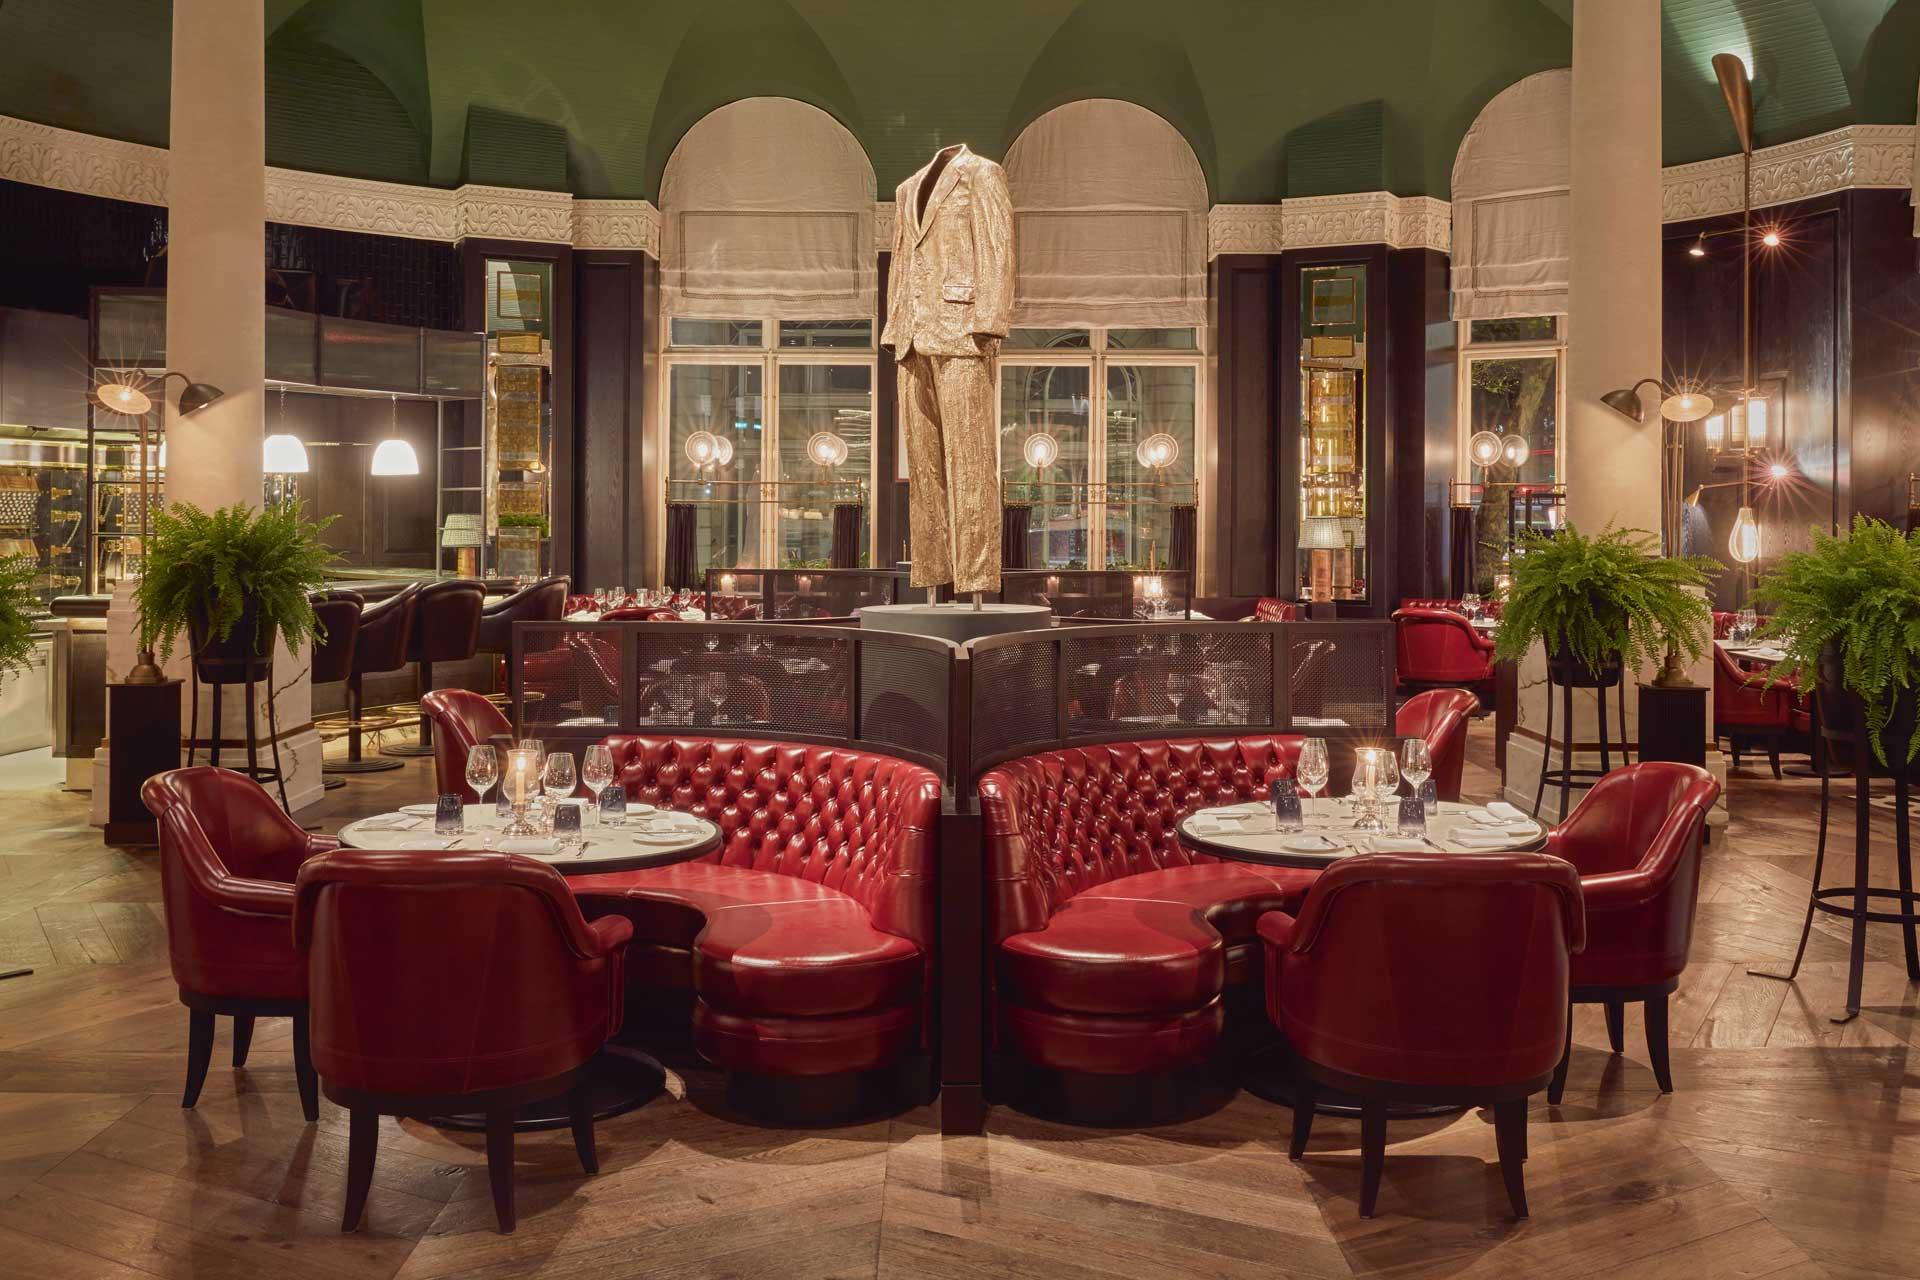 Kerridge's Bar & Grill restaurant in London's Corinthia Hotel